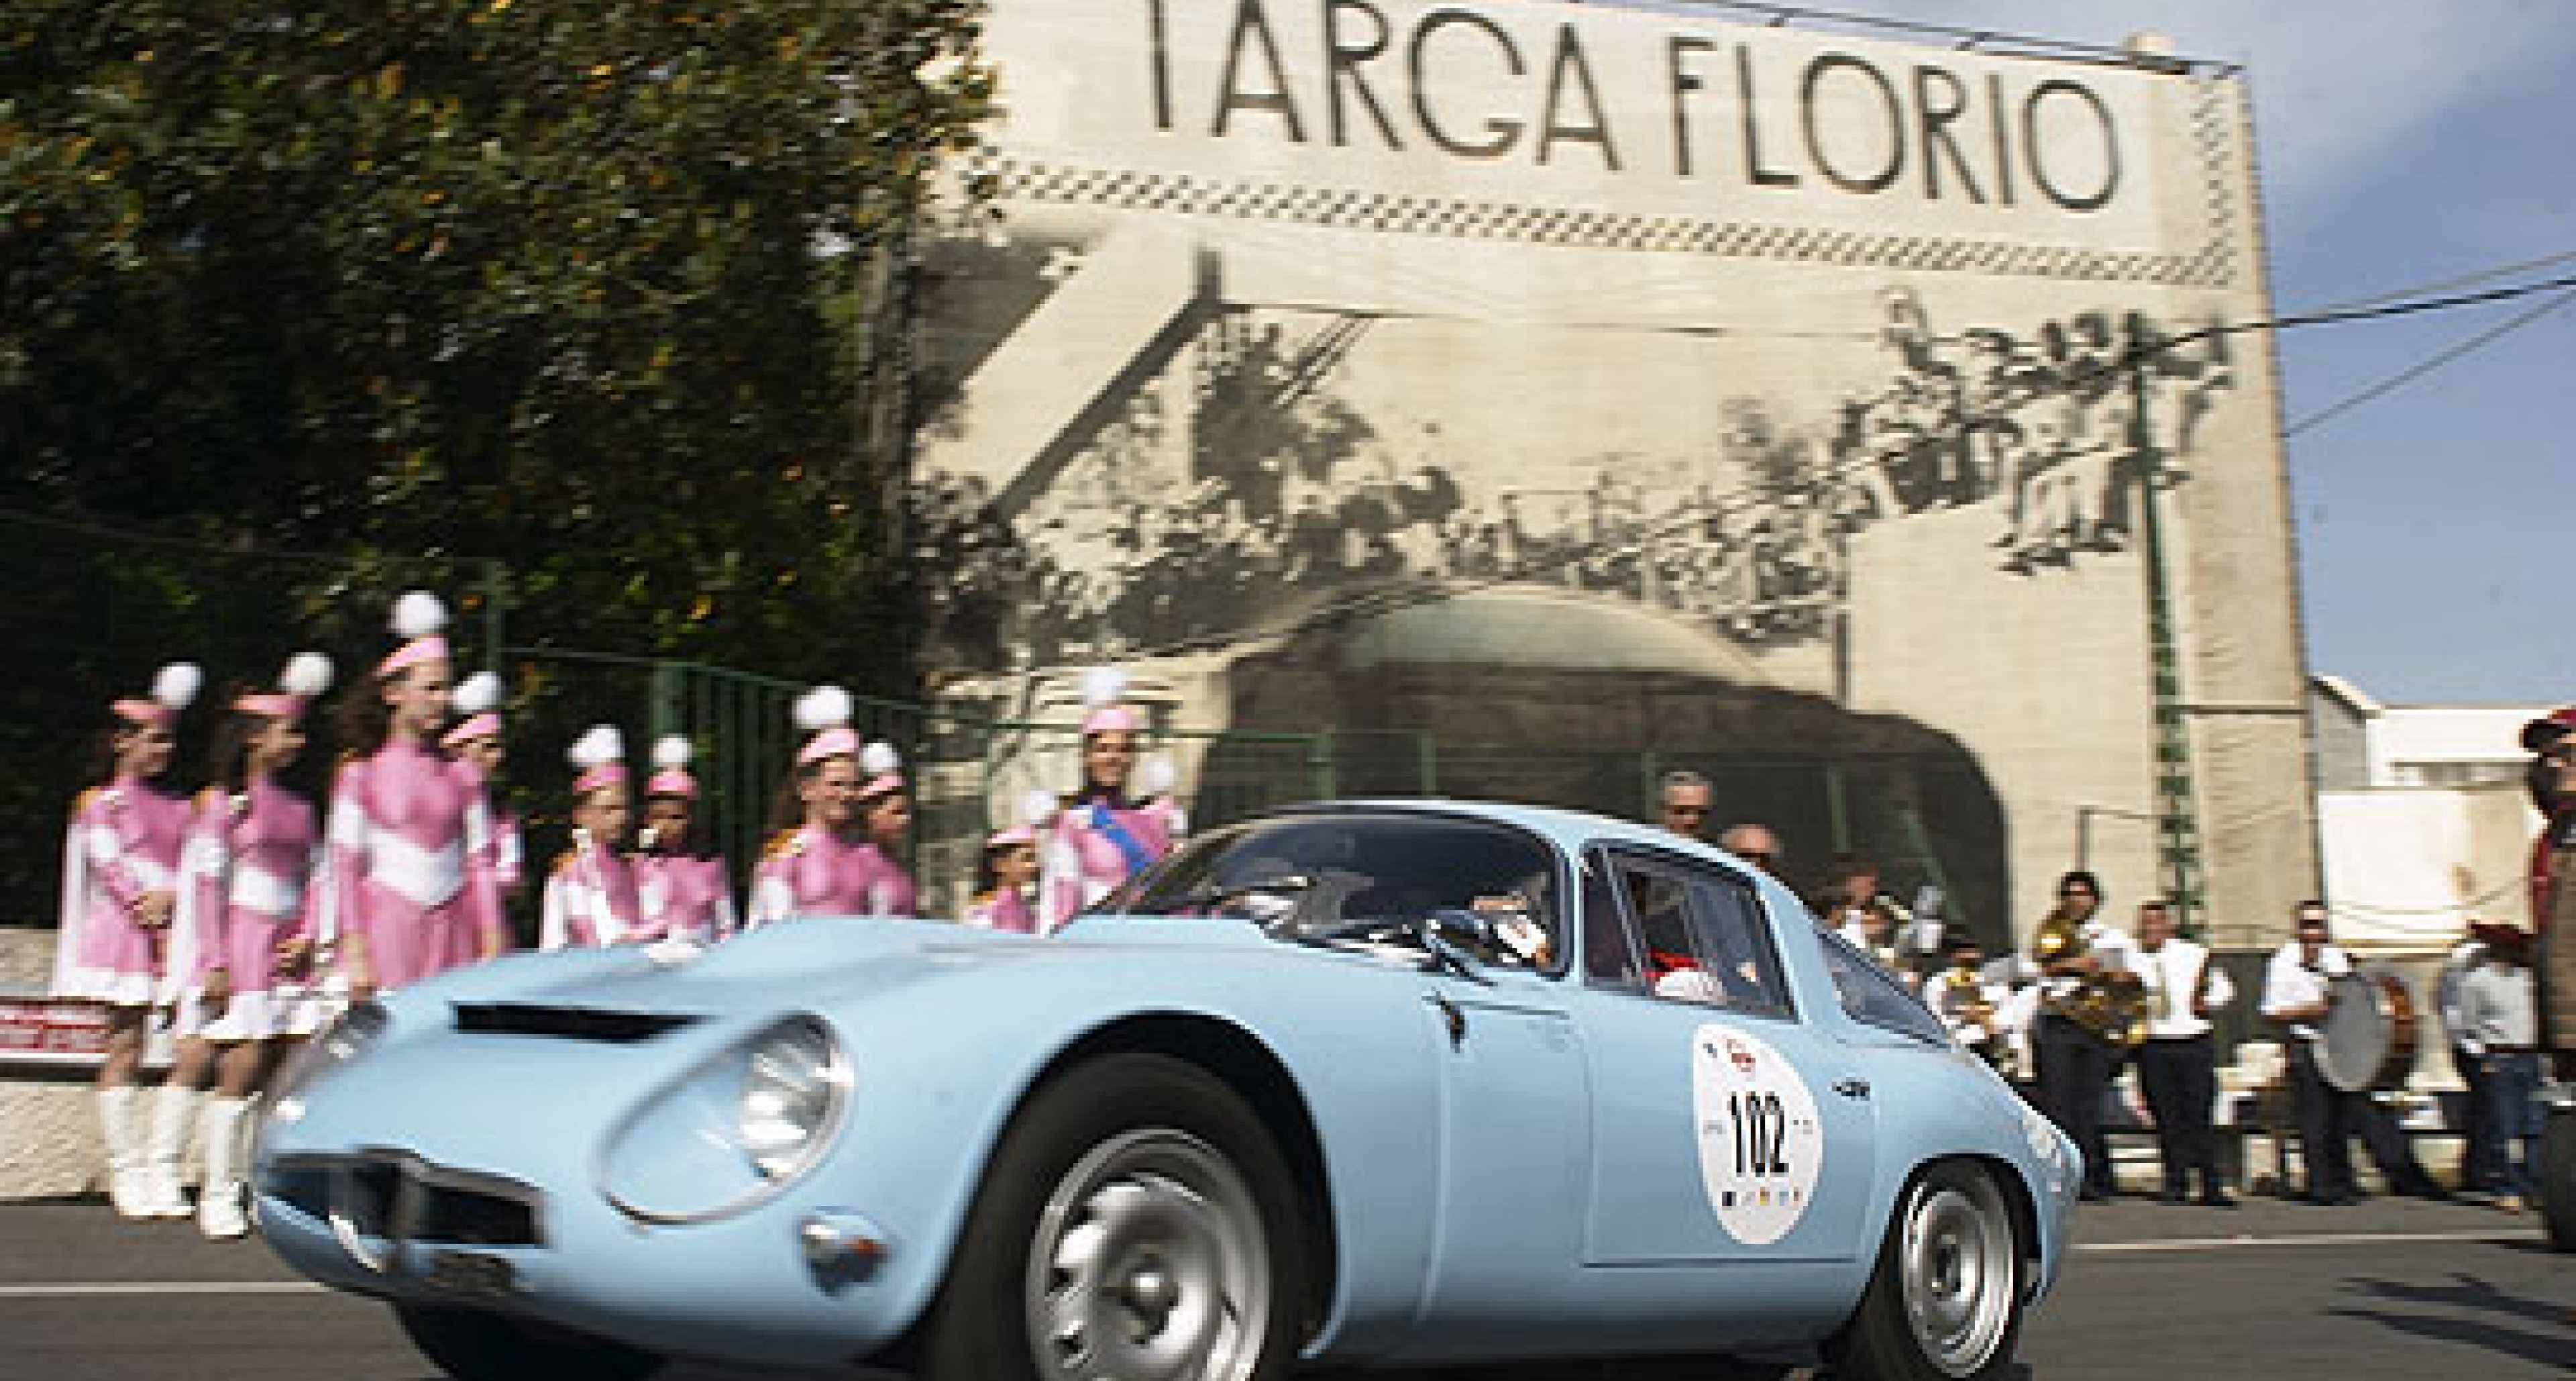 Happy Birthday Targa Florio